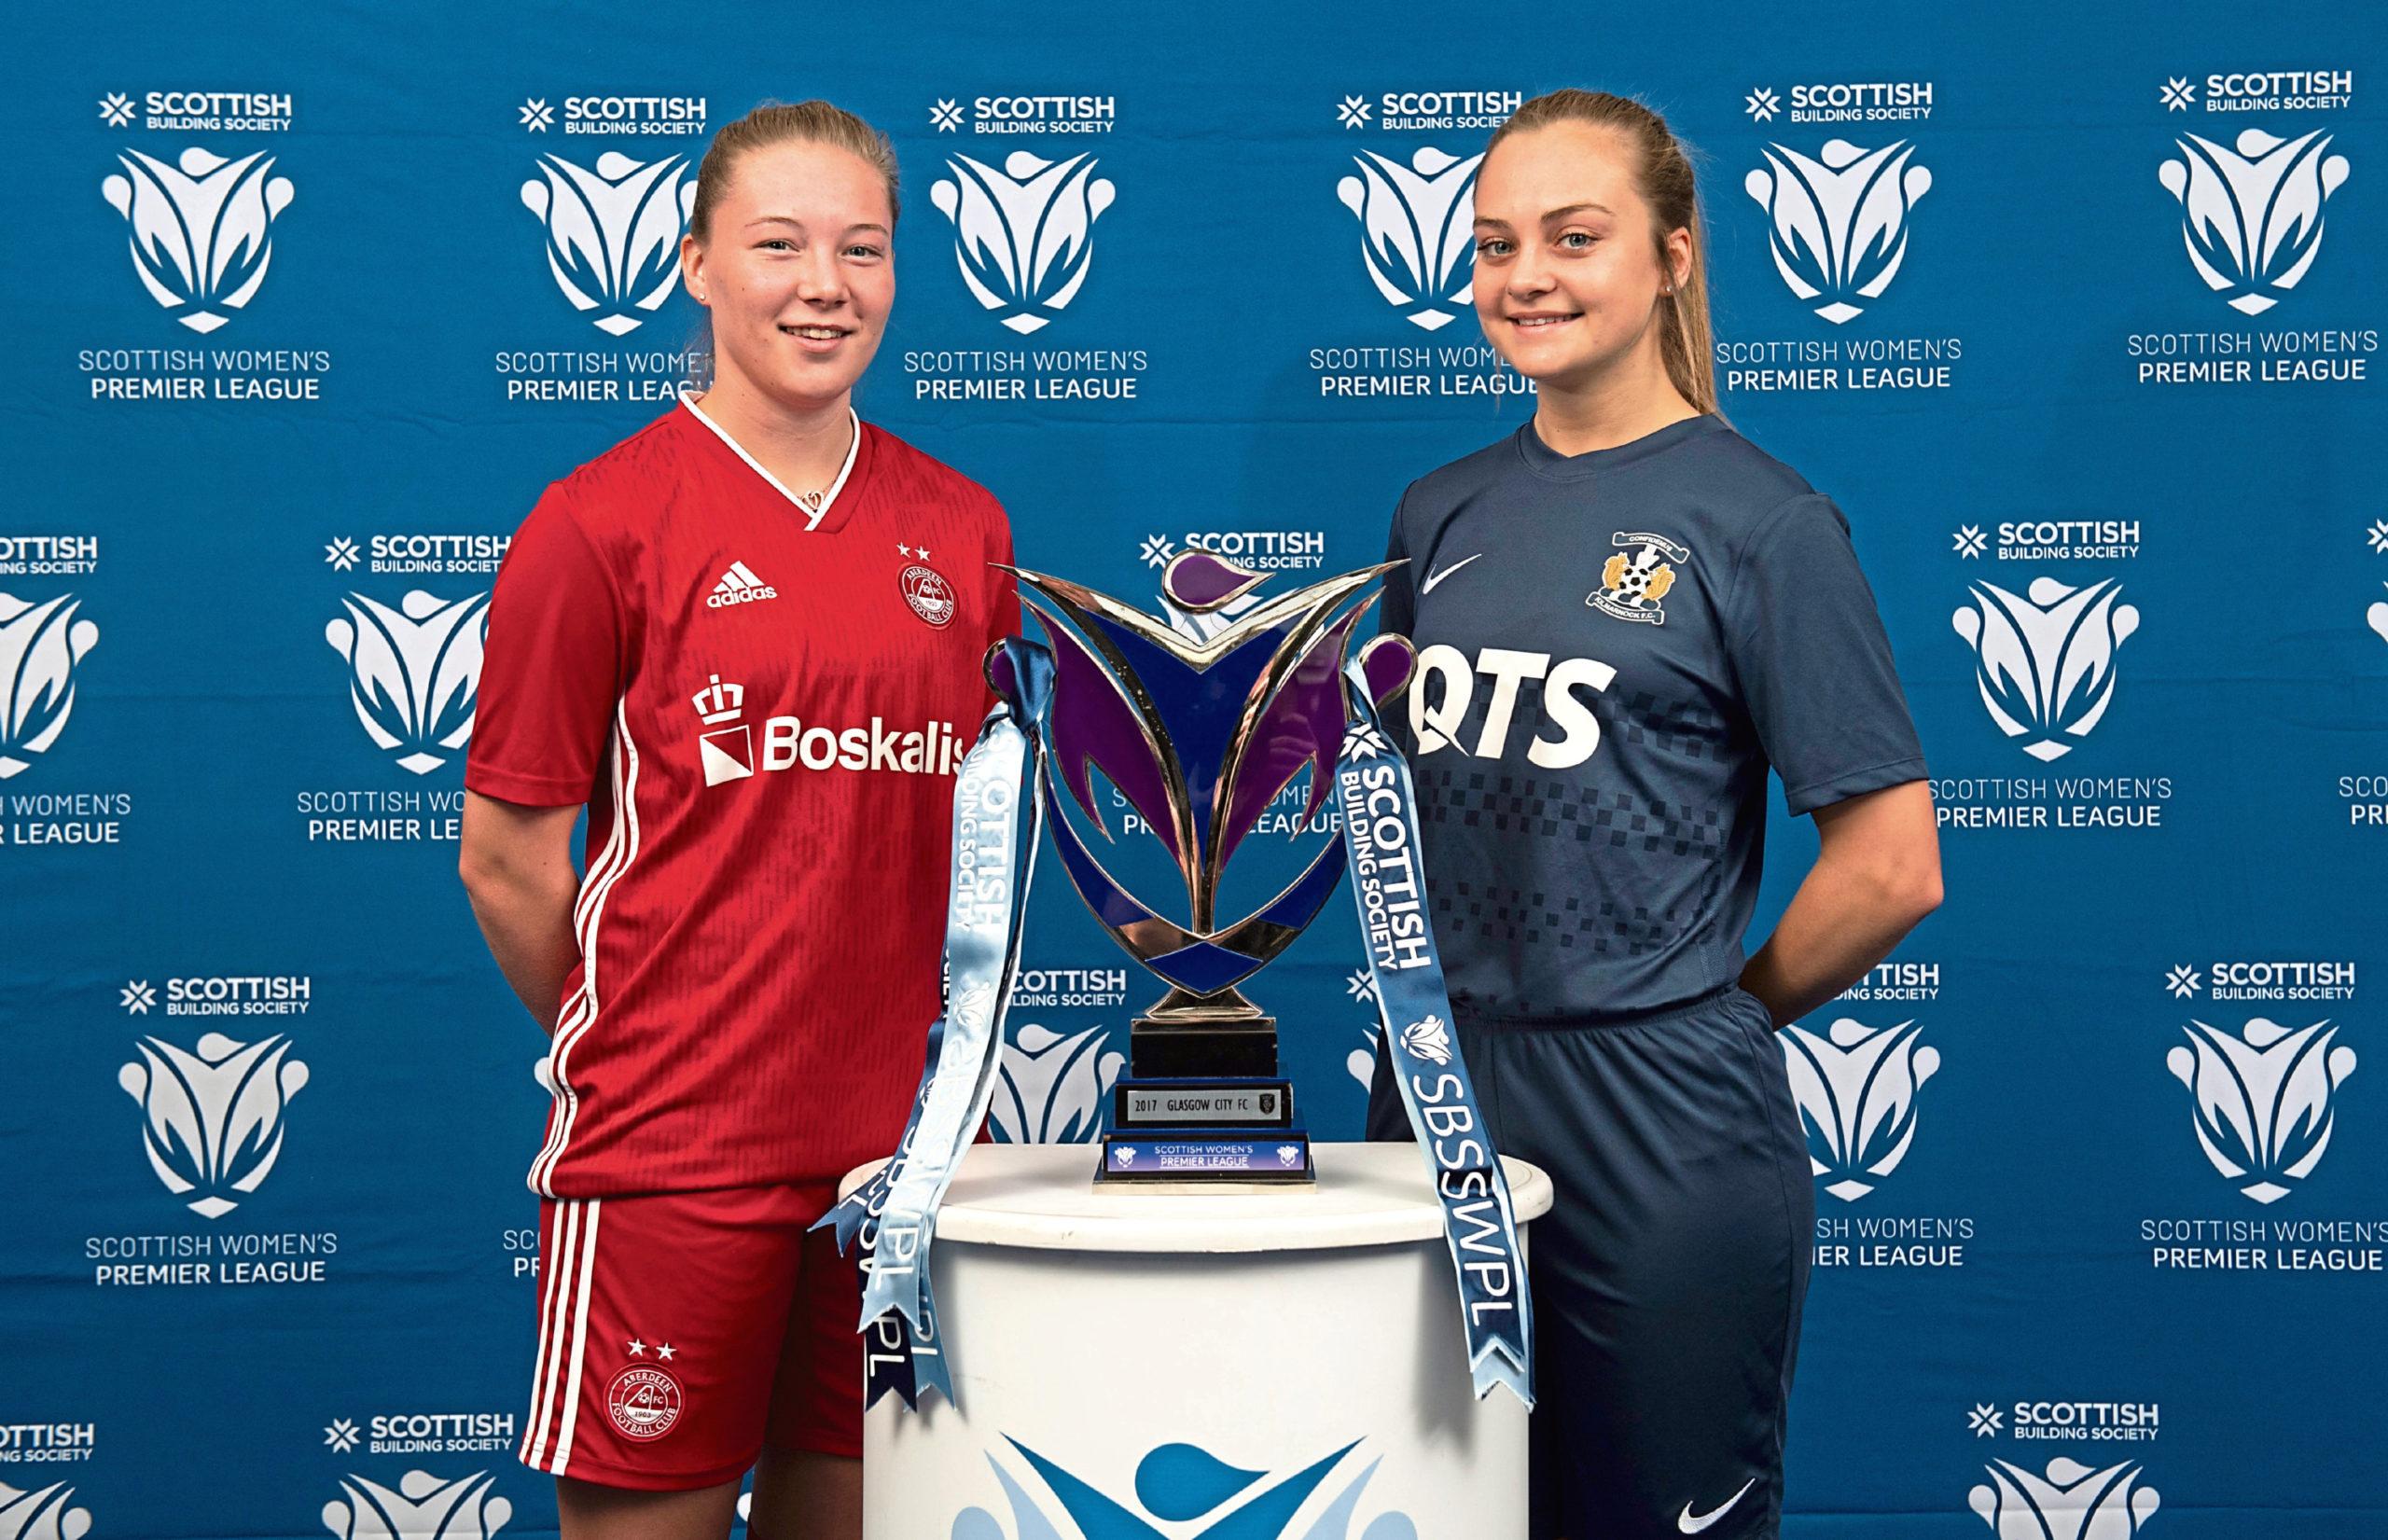 Aberdeen's Francesca Ogilvie and Kilmarnock's Laura Neil at the launch of the new Scottish Building Society SWPL season.